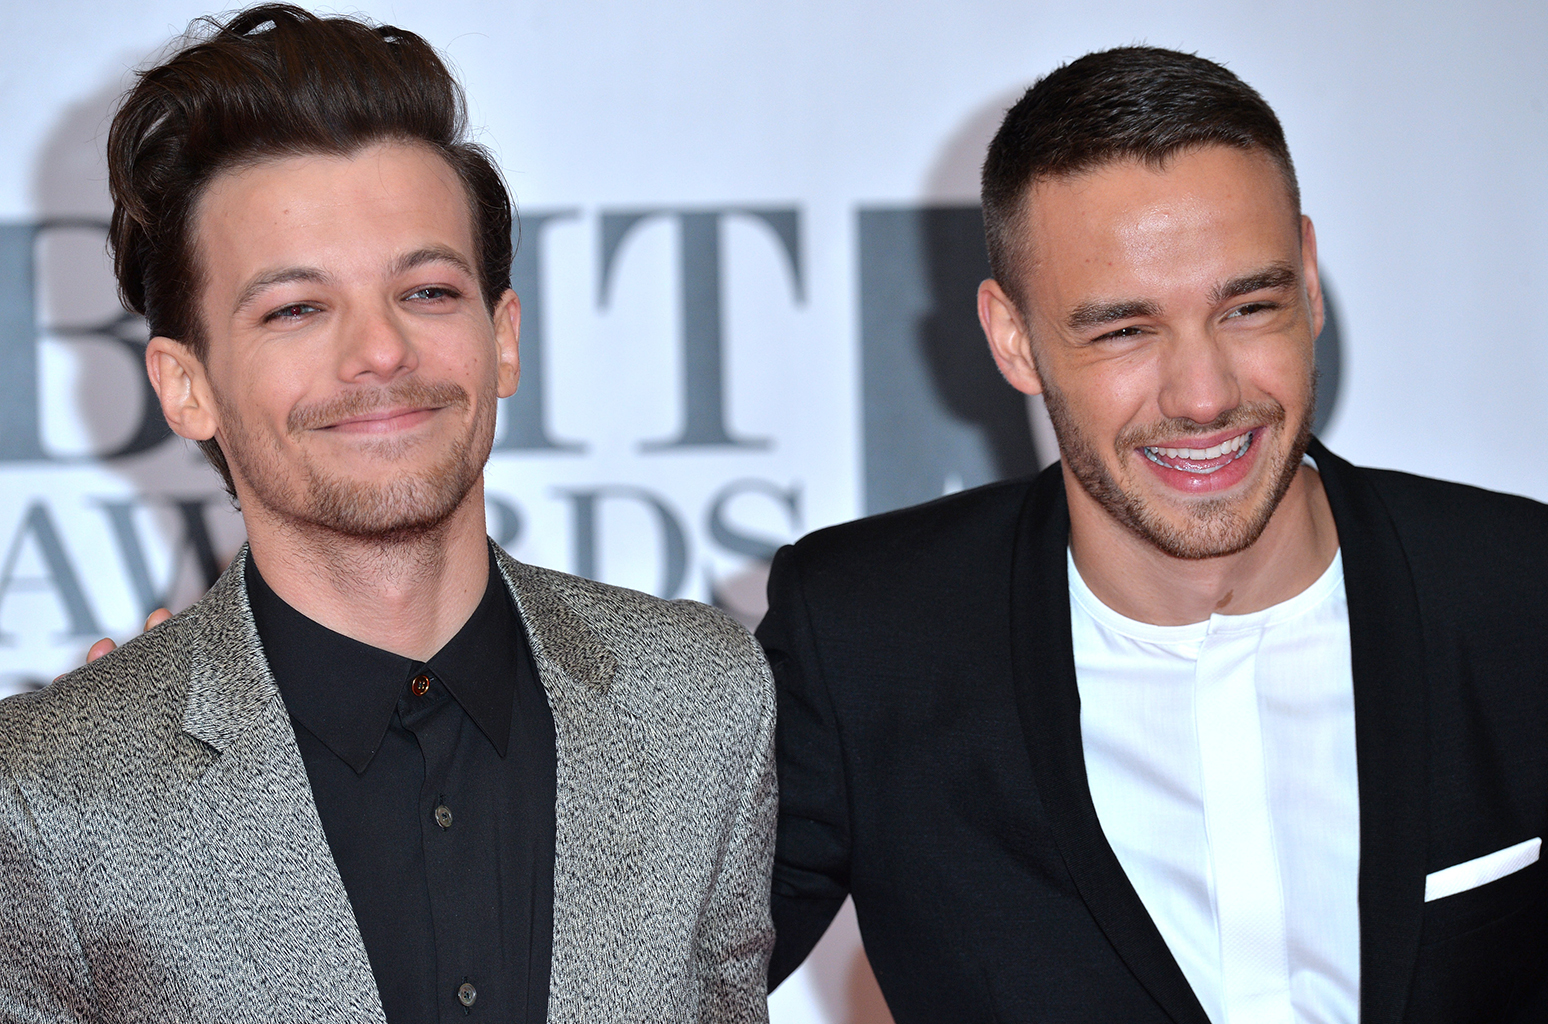 Liam Payne y Louis Tomlinson se reunen para el Stand Up to Cancer 'Gogglebox'